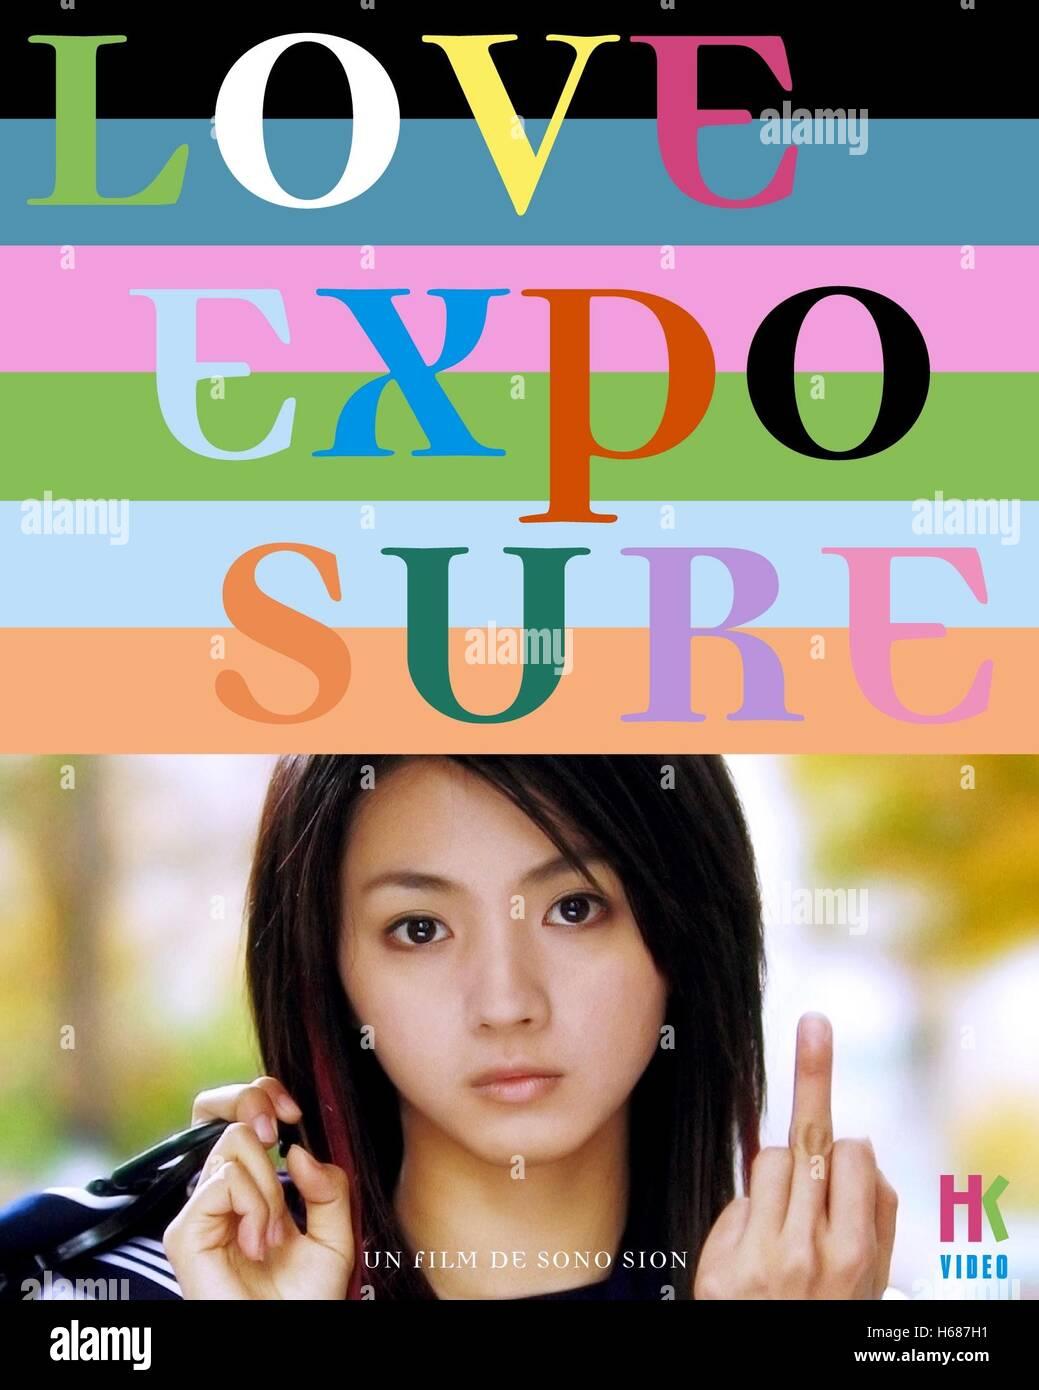 HIKARI MITSUSHIMA POSTER LOVE EXPOSURE; AI NO MUKIDASHI (2008) - Stock Image